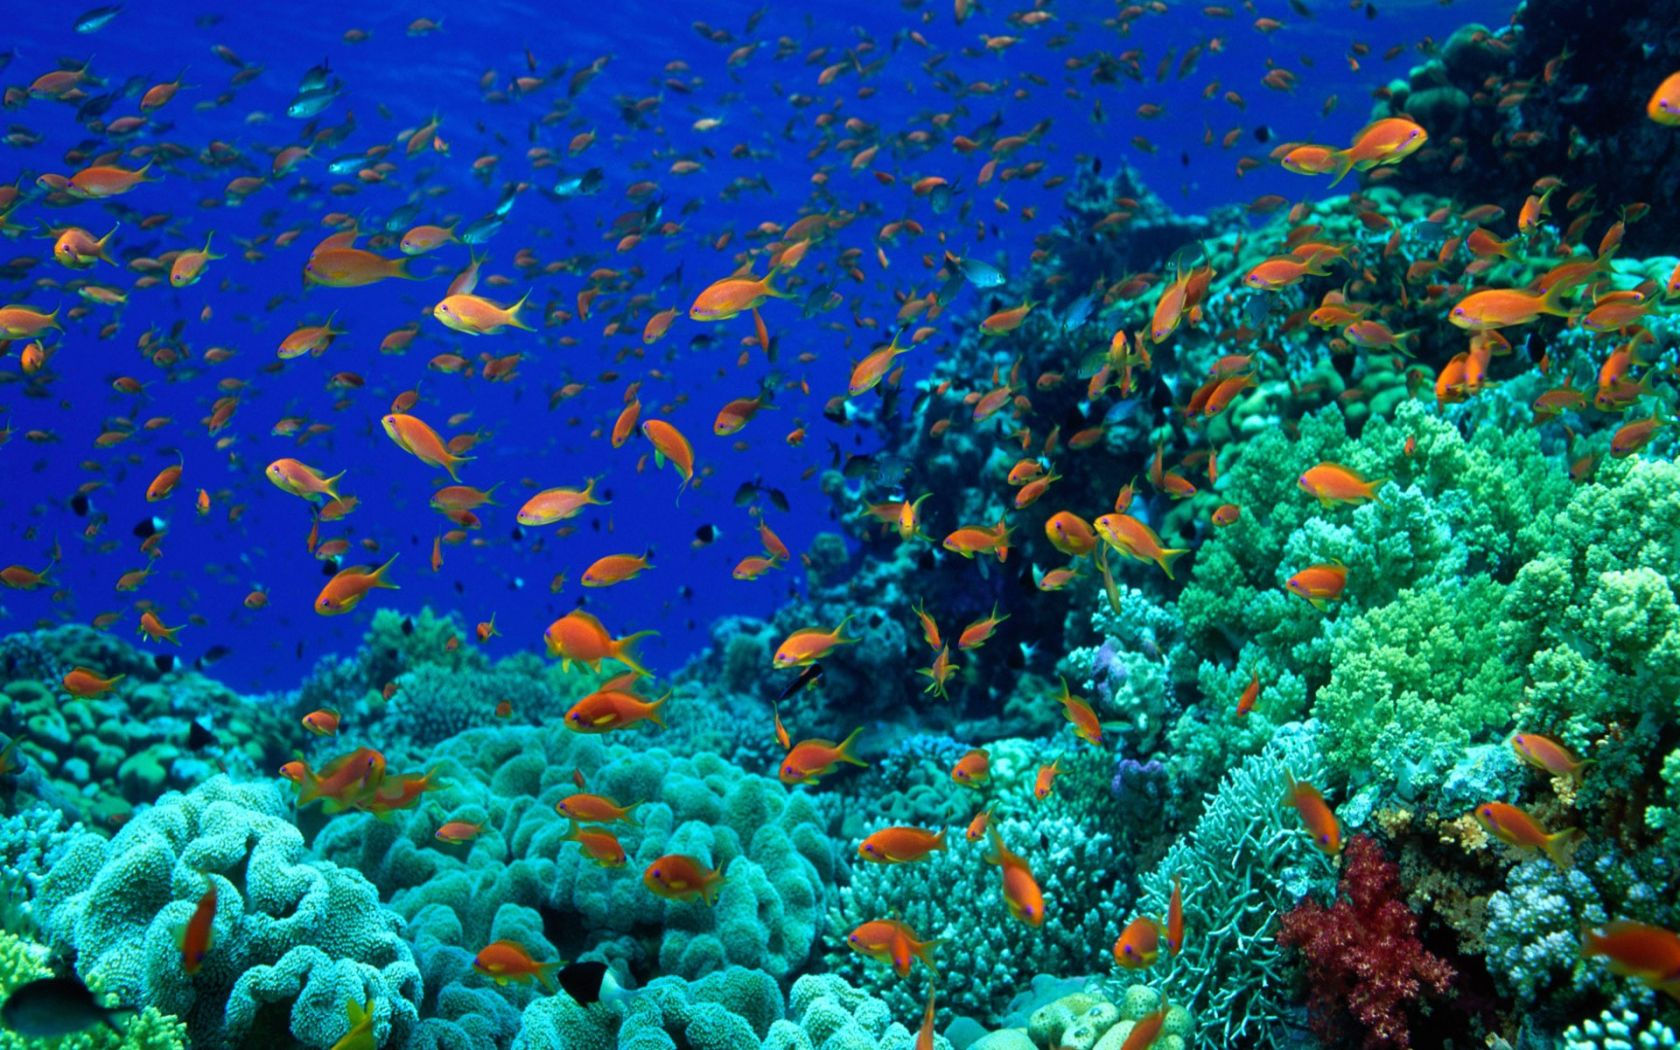 Colorful Fish Underwaterworld Wallpaper 1680x1050 12298